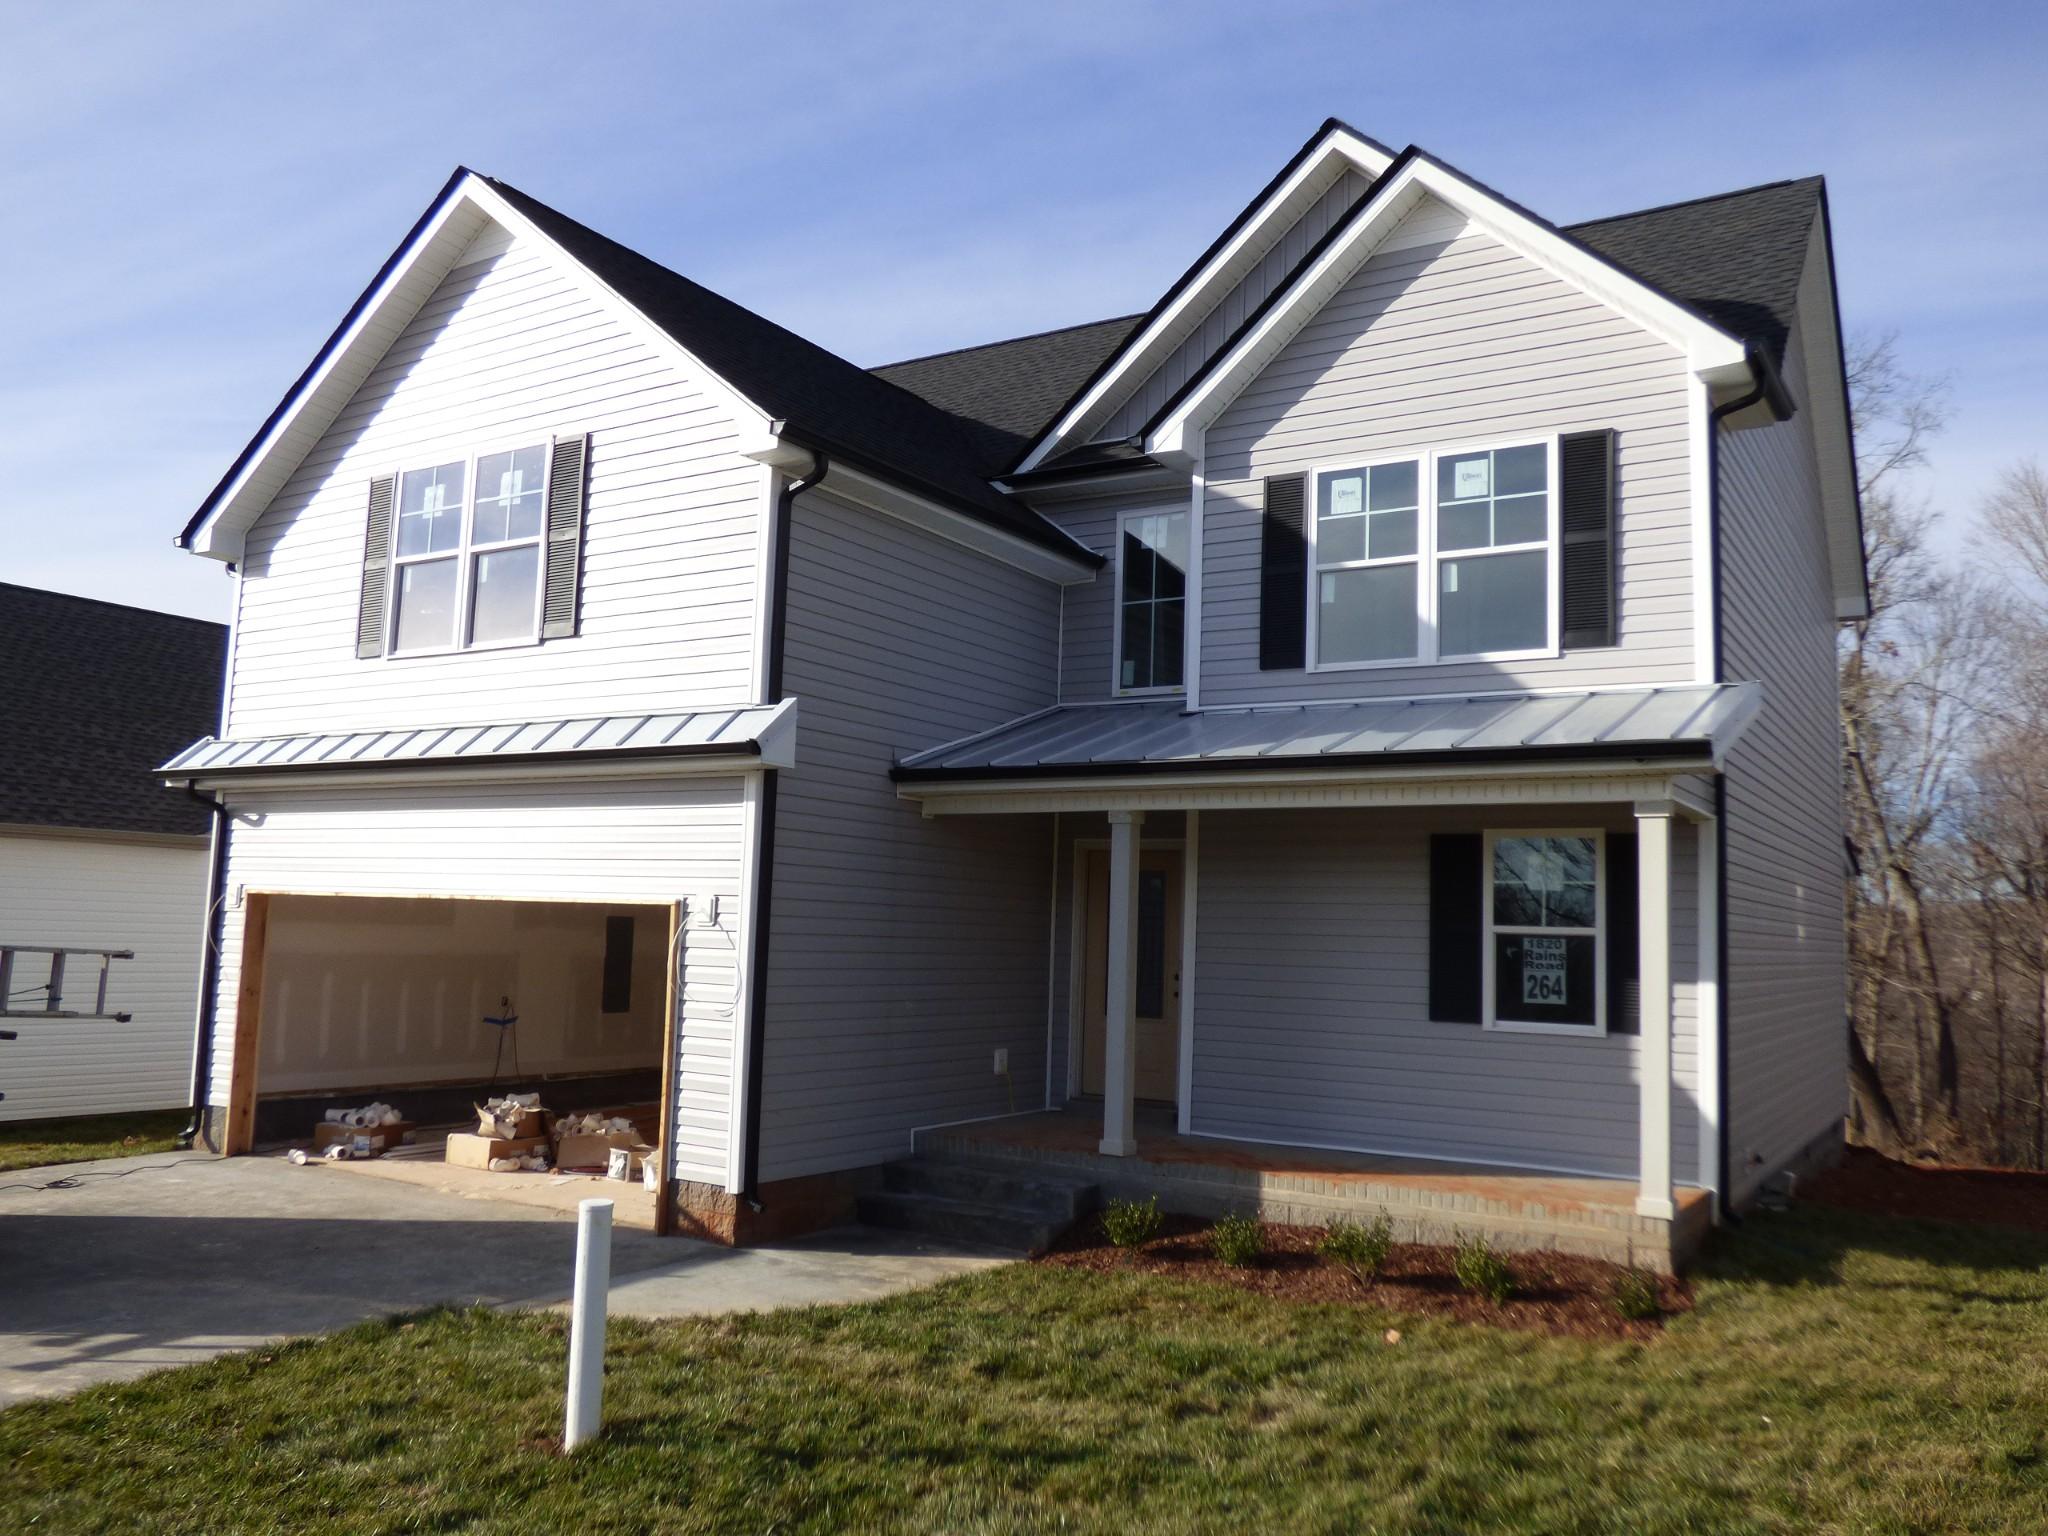 1820 Rains Rd, Clarksville, TN 37042 - Clarksville, TN real estate listing